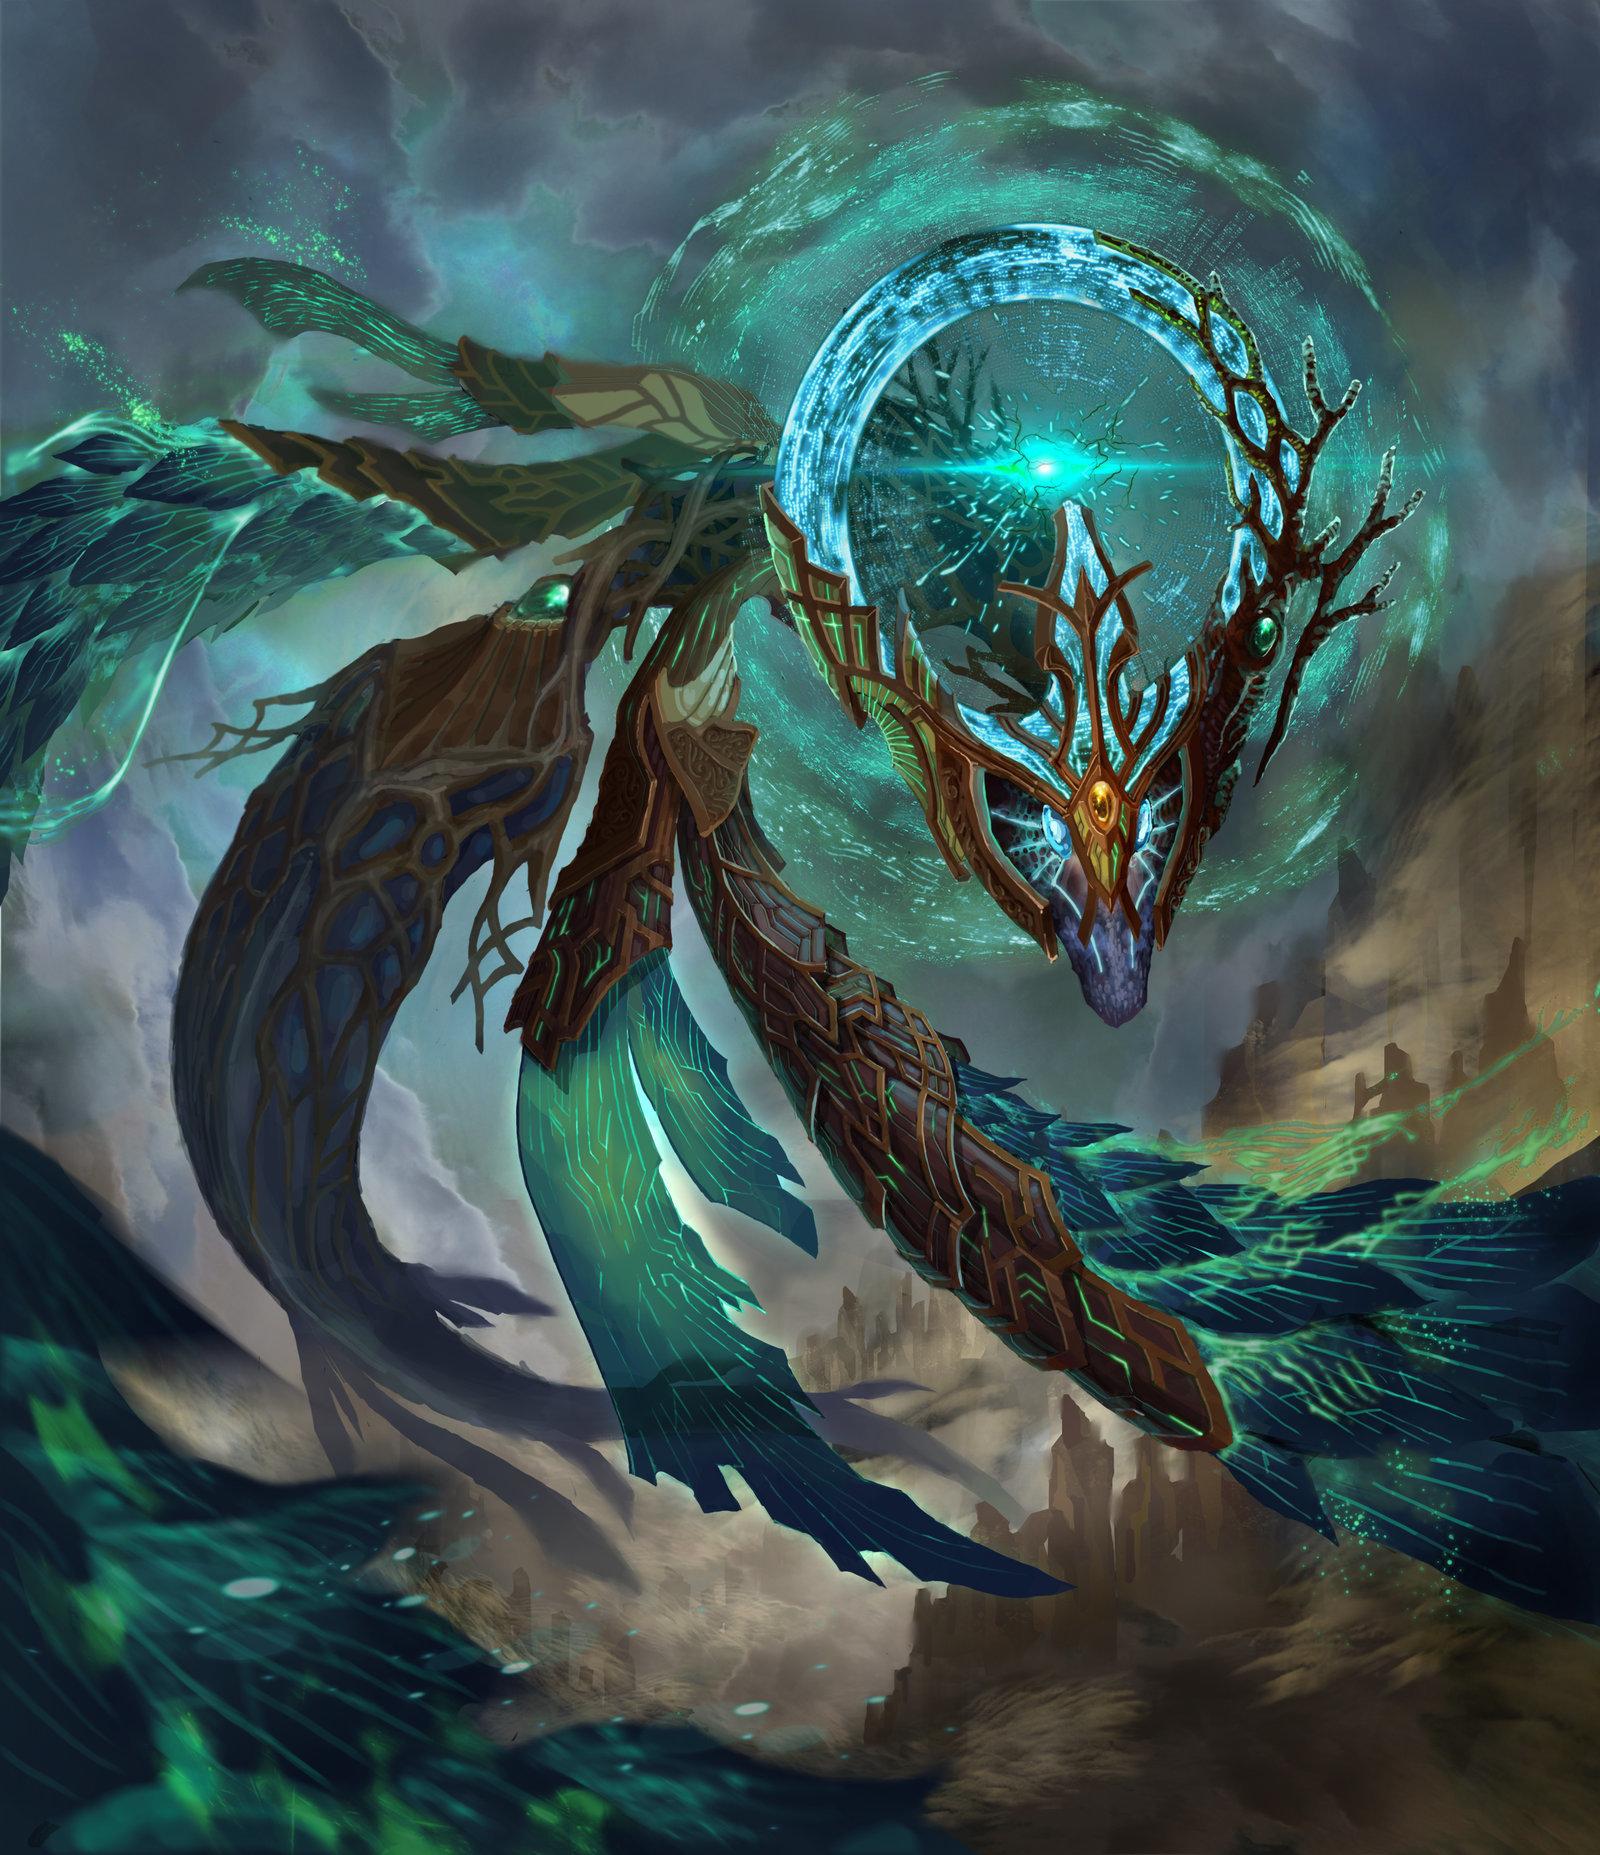 Artstation - Ancient Dragon Huy Van